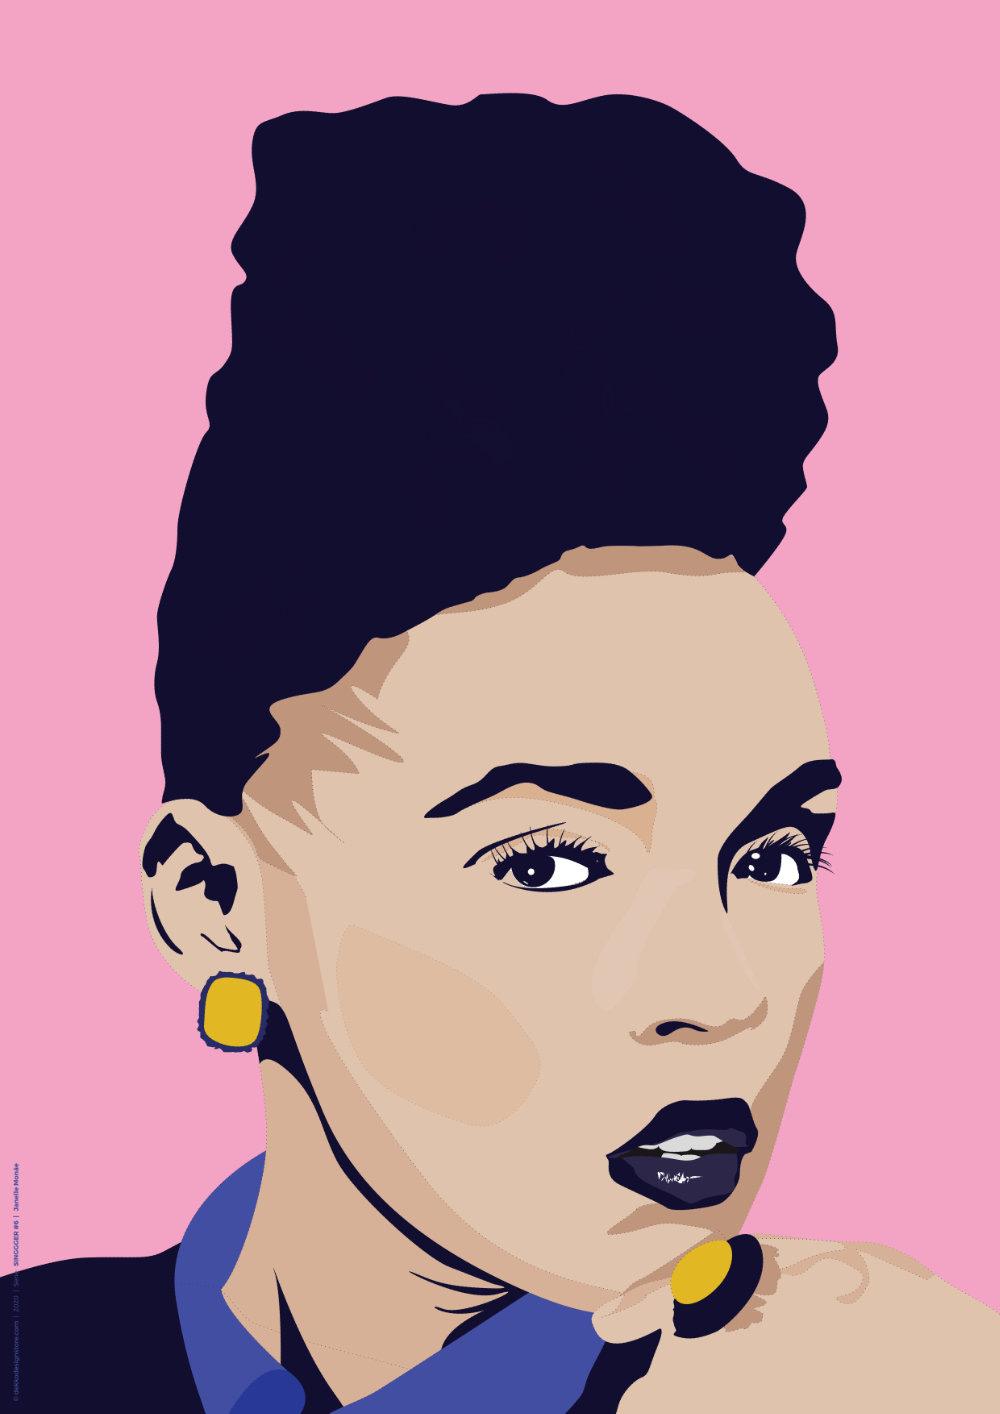 SINGGGER #6 | Janelle Monáe